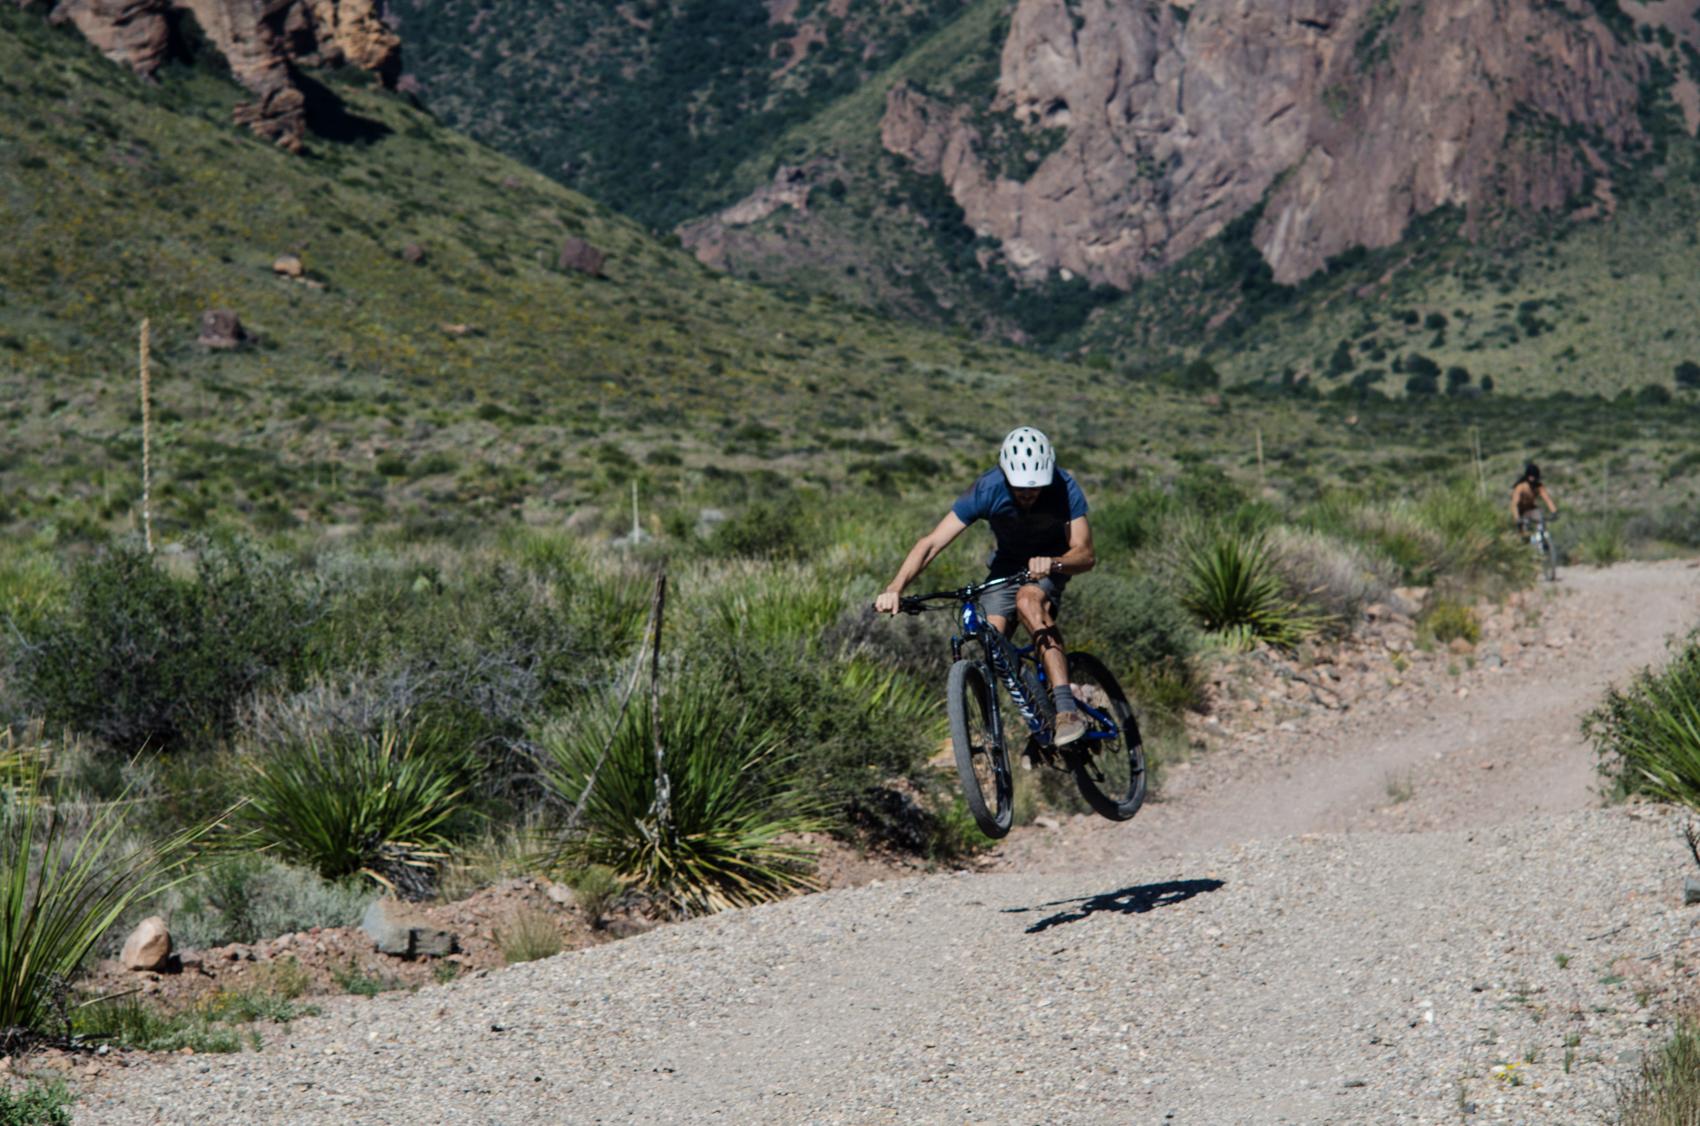 Mountain biking in big bend national park-leh cycling goods-18.jpg